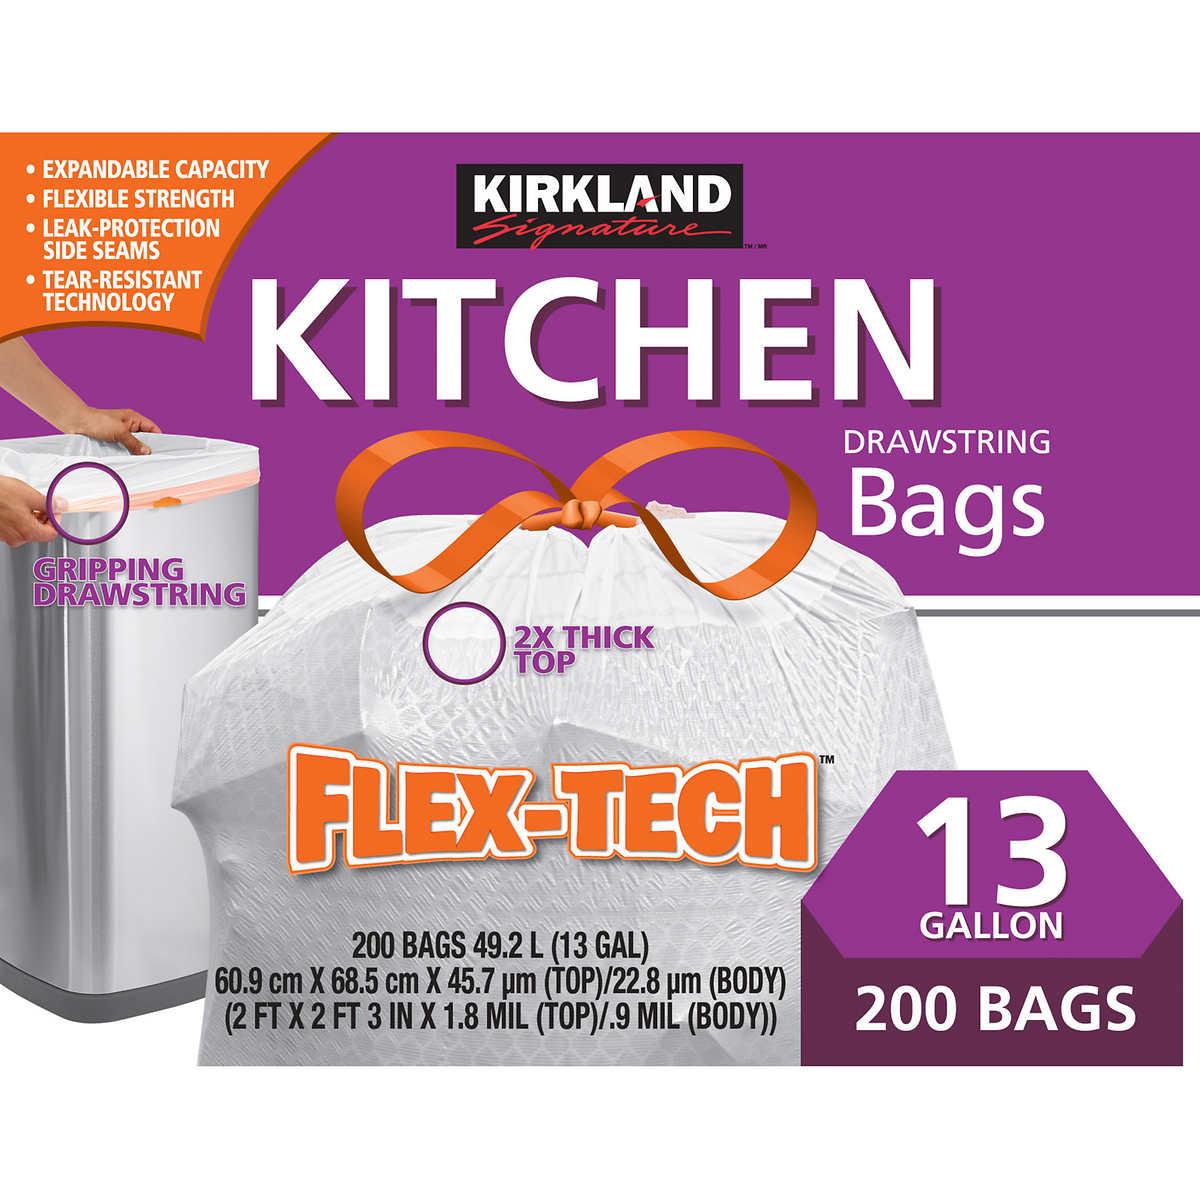 Kirkland Signature Flex Tech 13 Gallon Kitchen Trash Bag 200 Count Costco